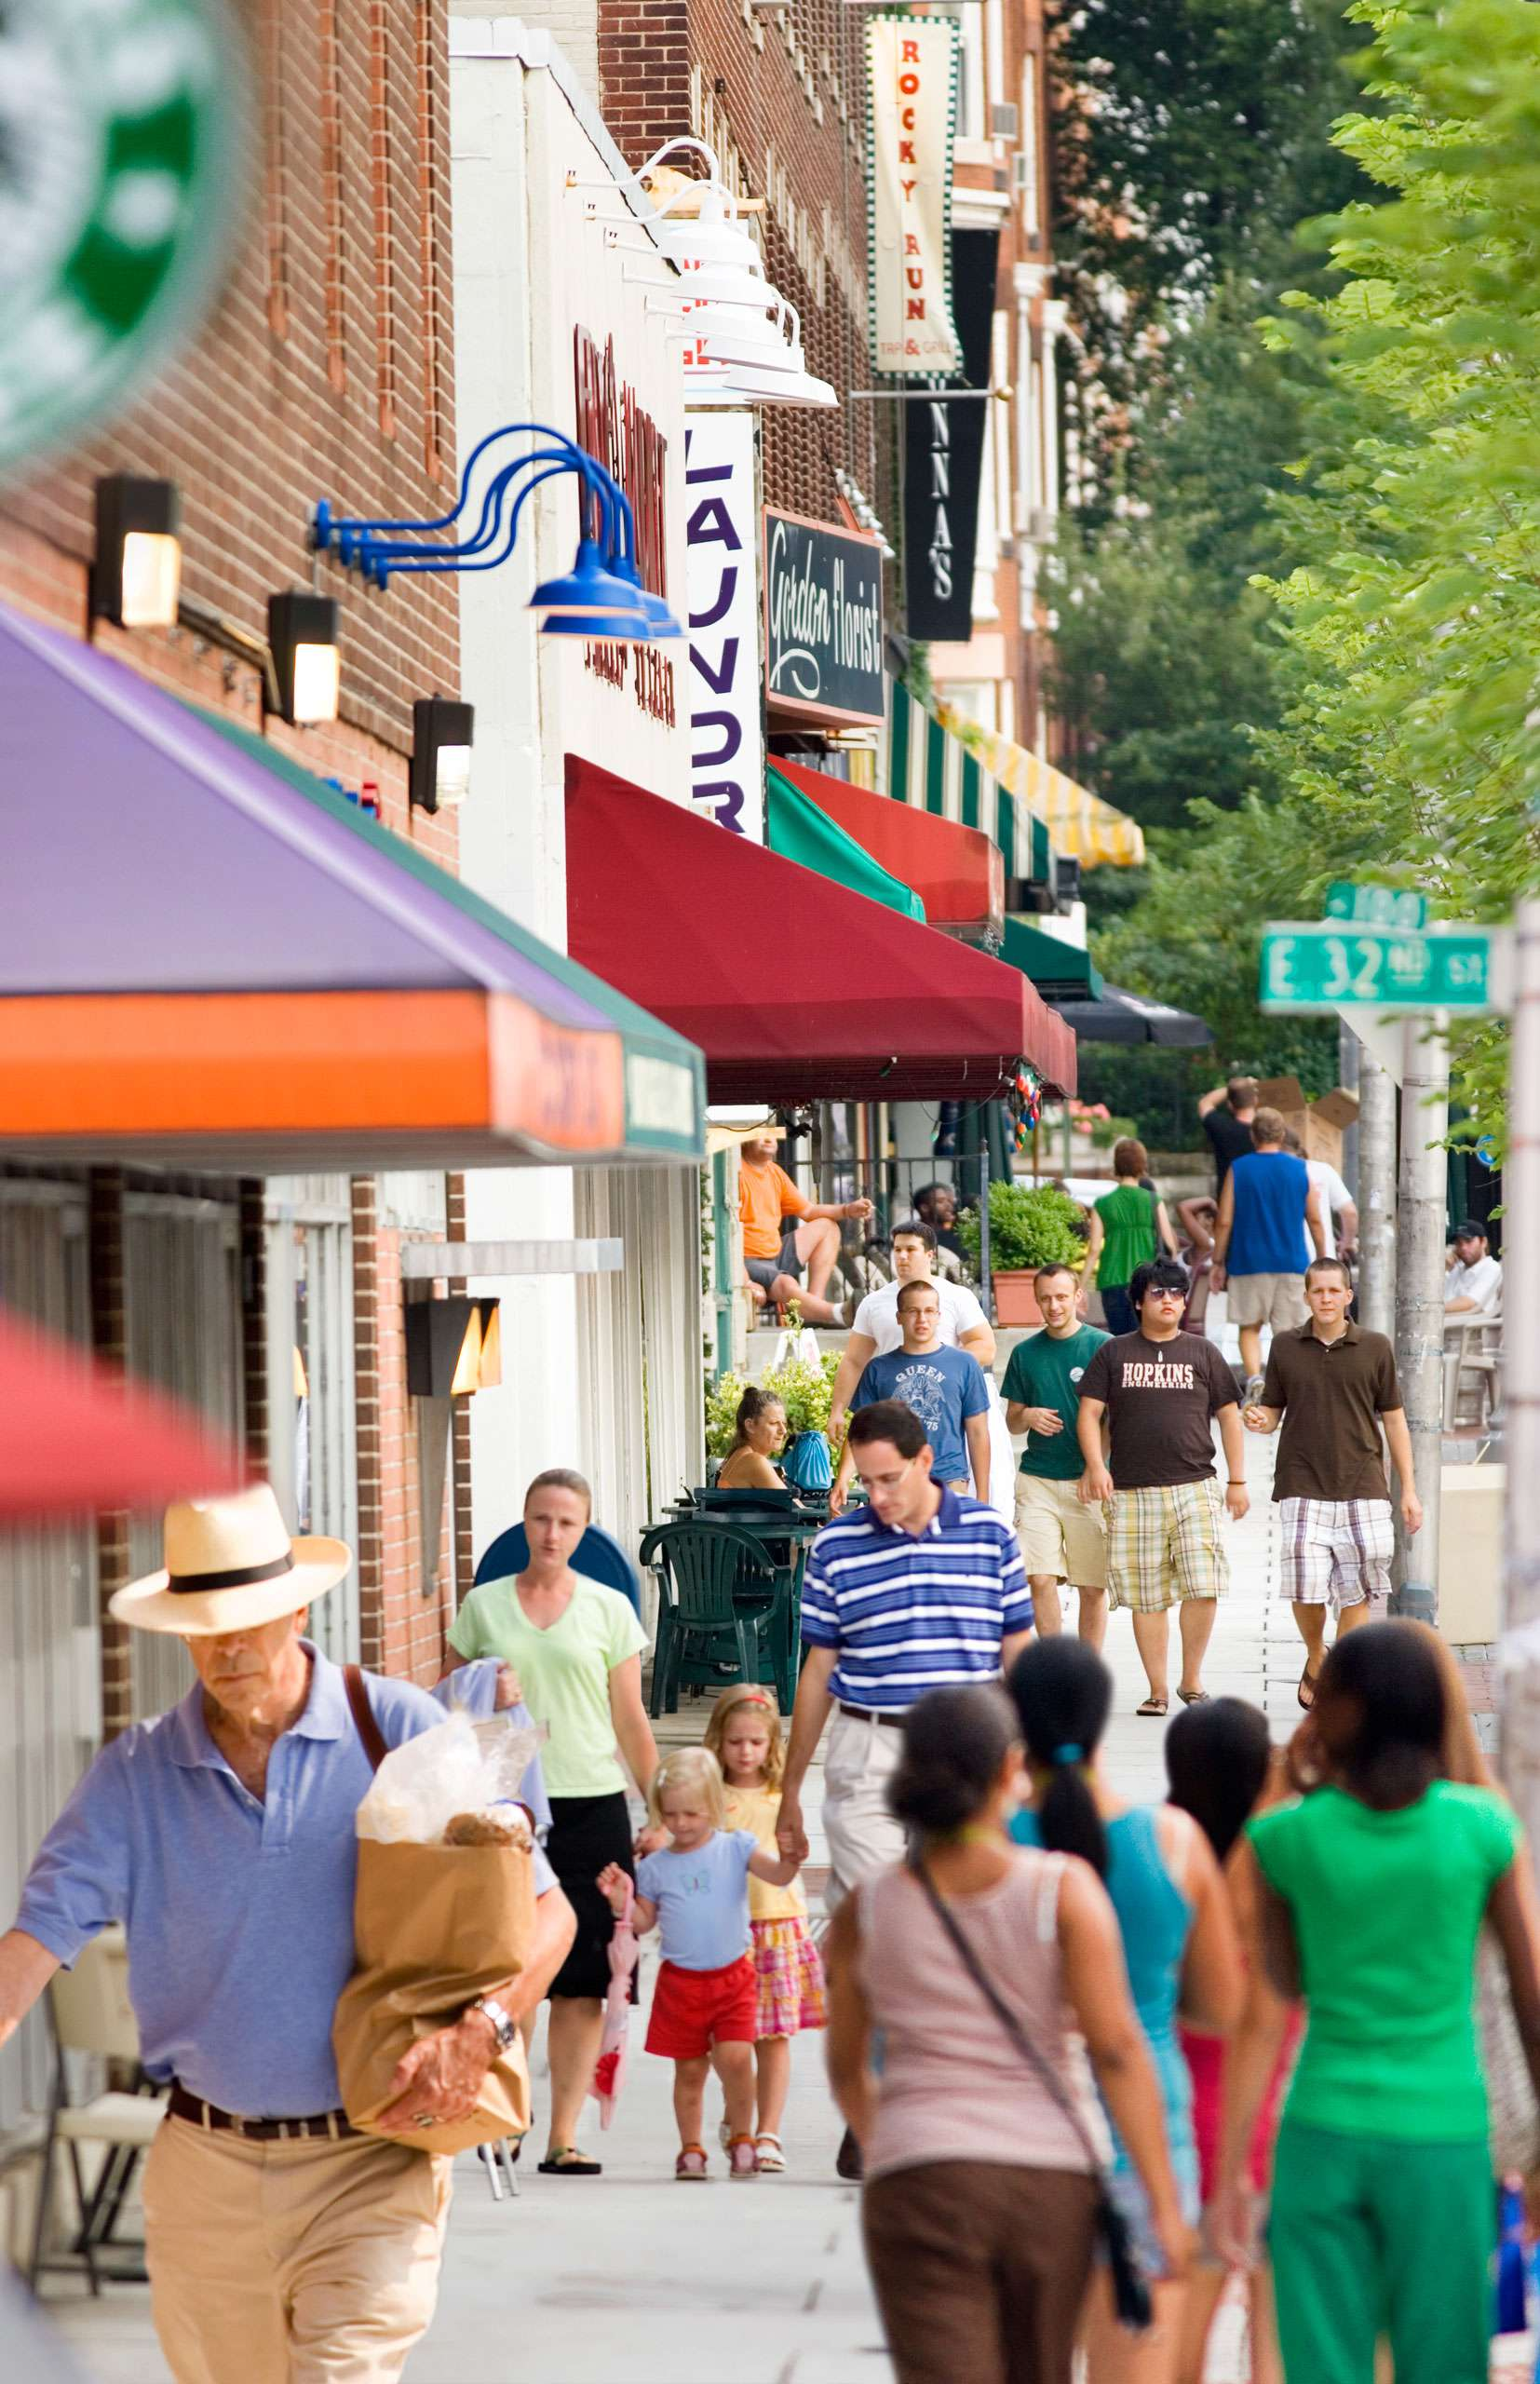 PORTFOLIO - Baltimore - Neighborhoods #14